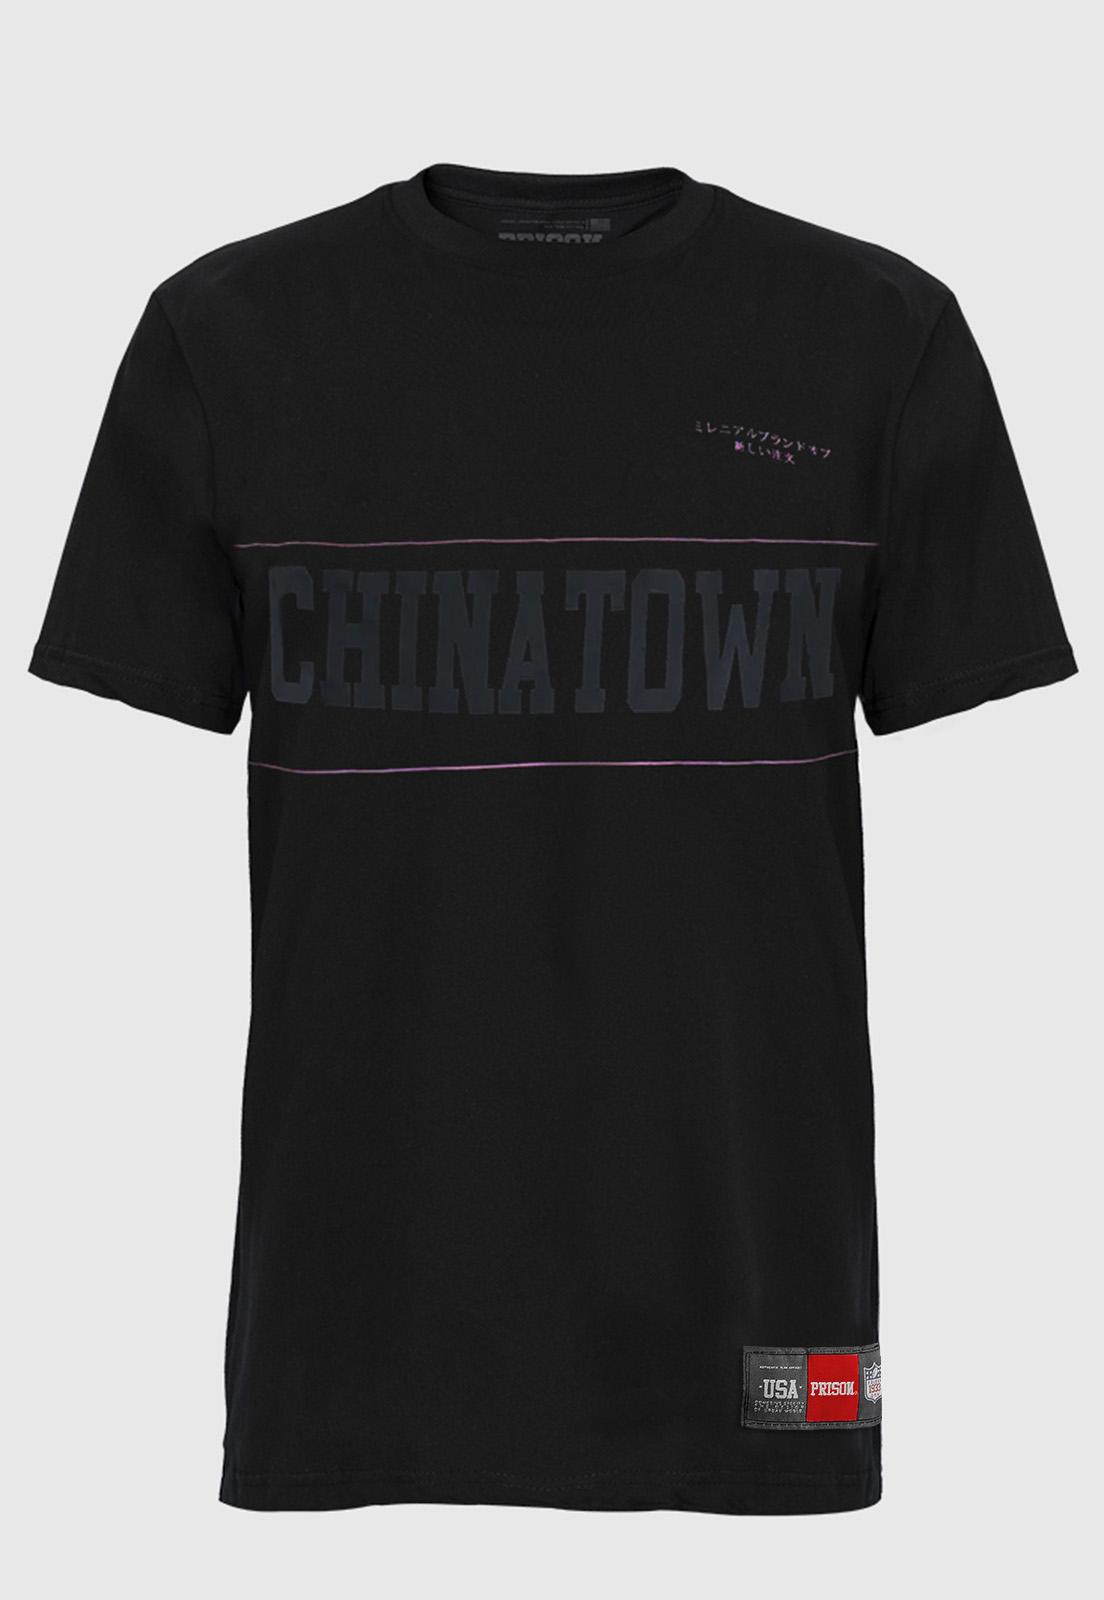 Camiseta Prison chinatown Pink line Preta